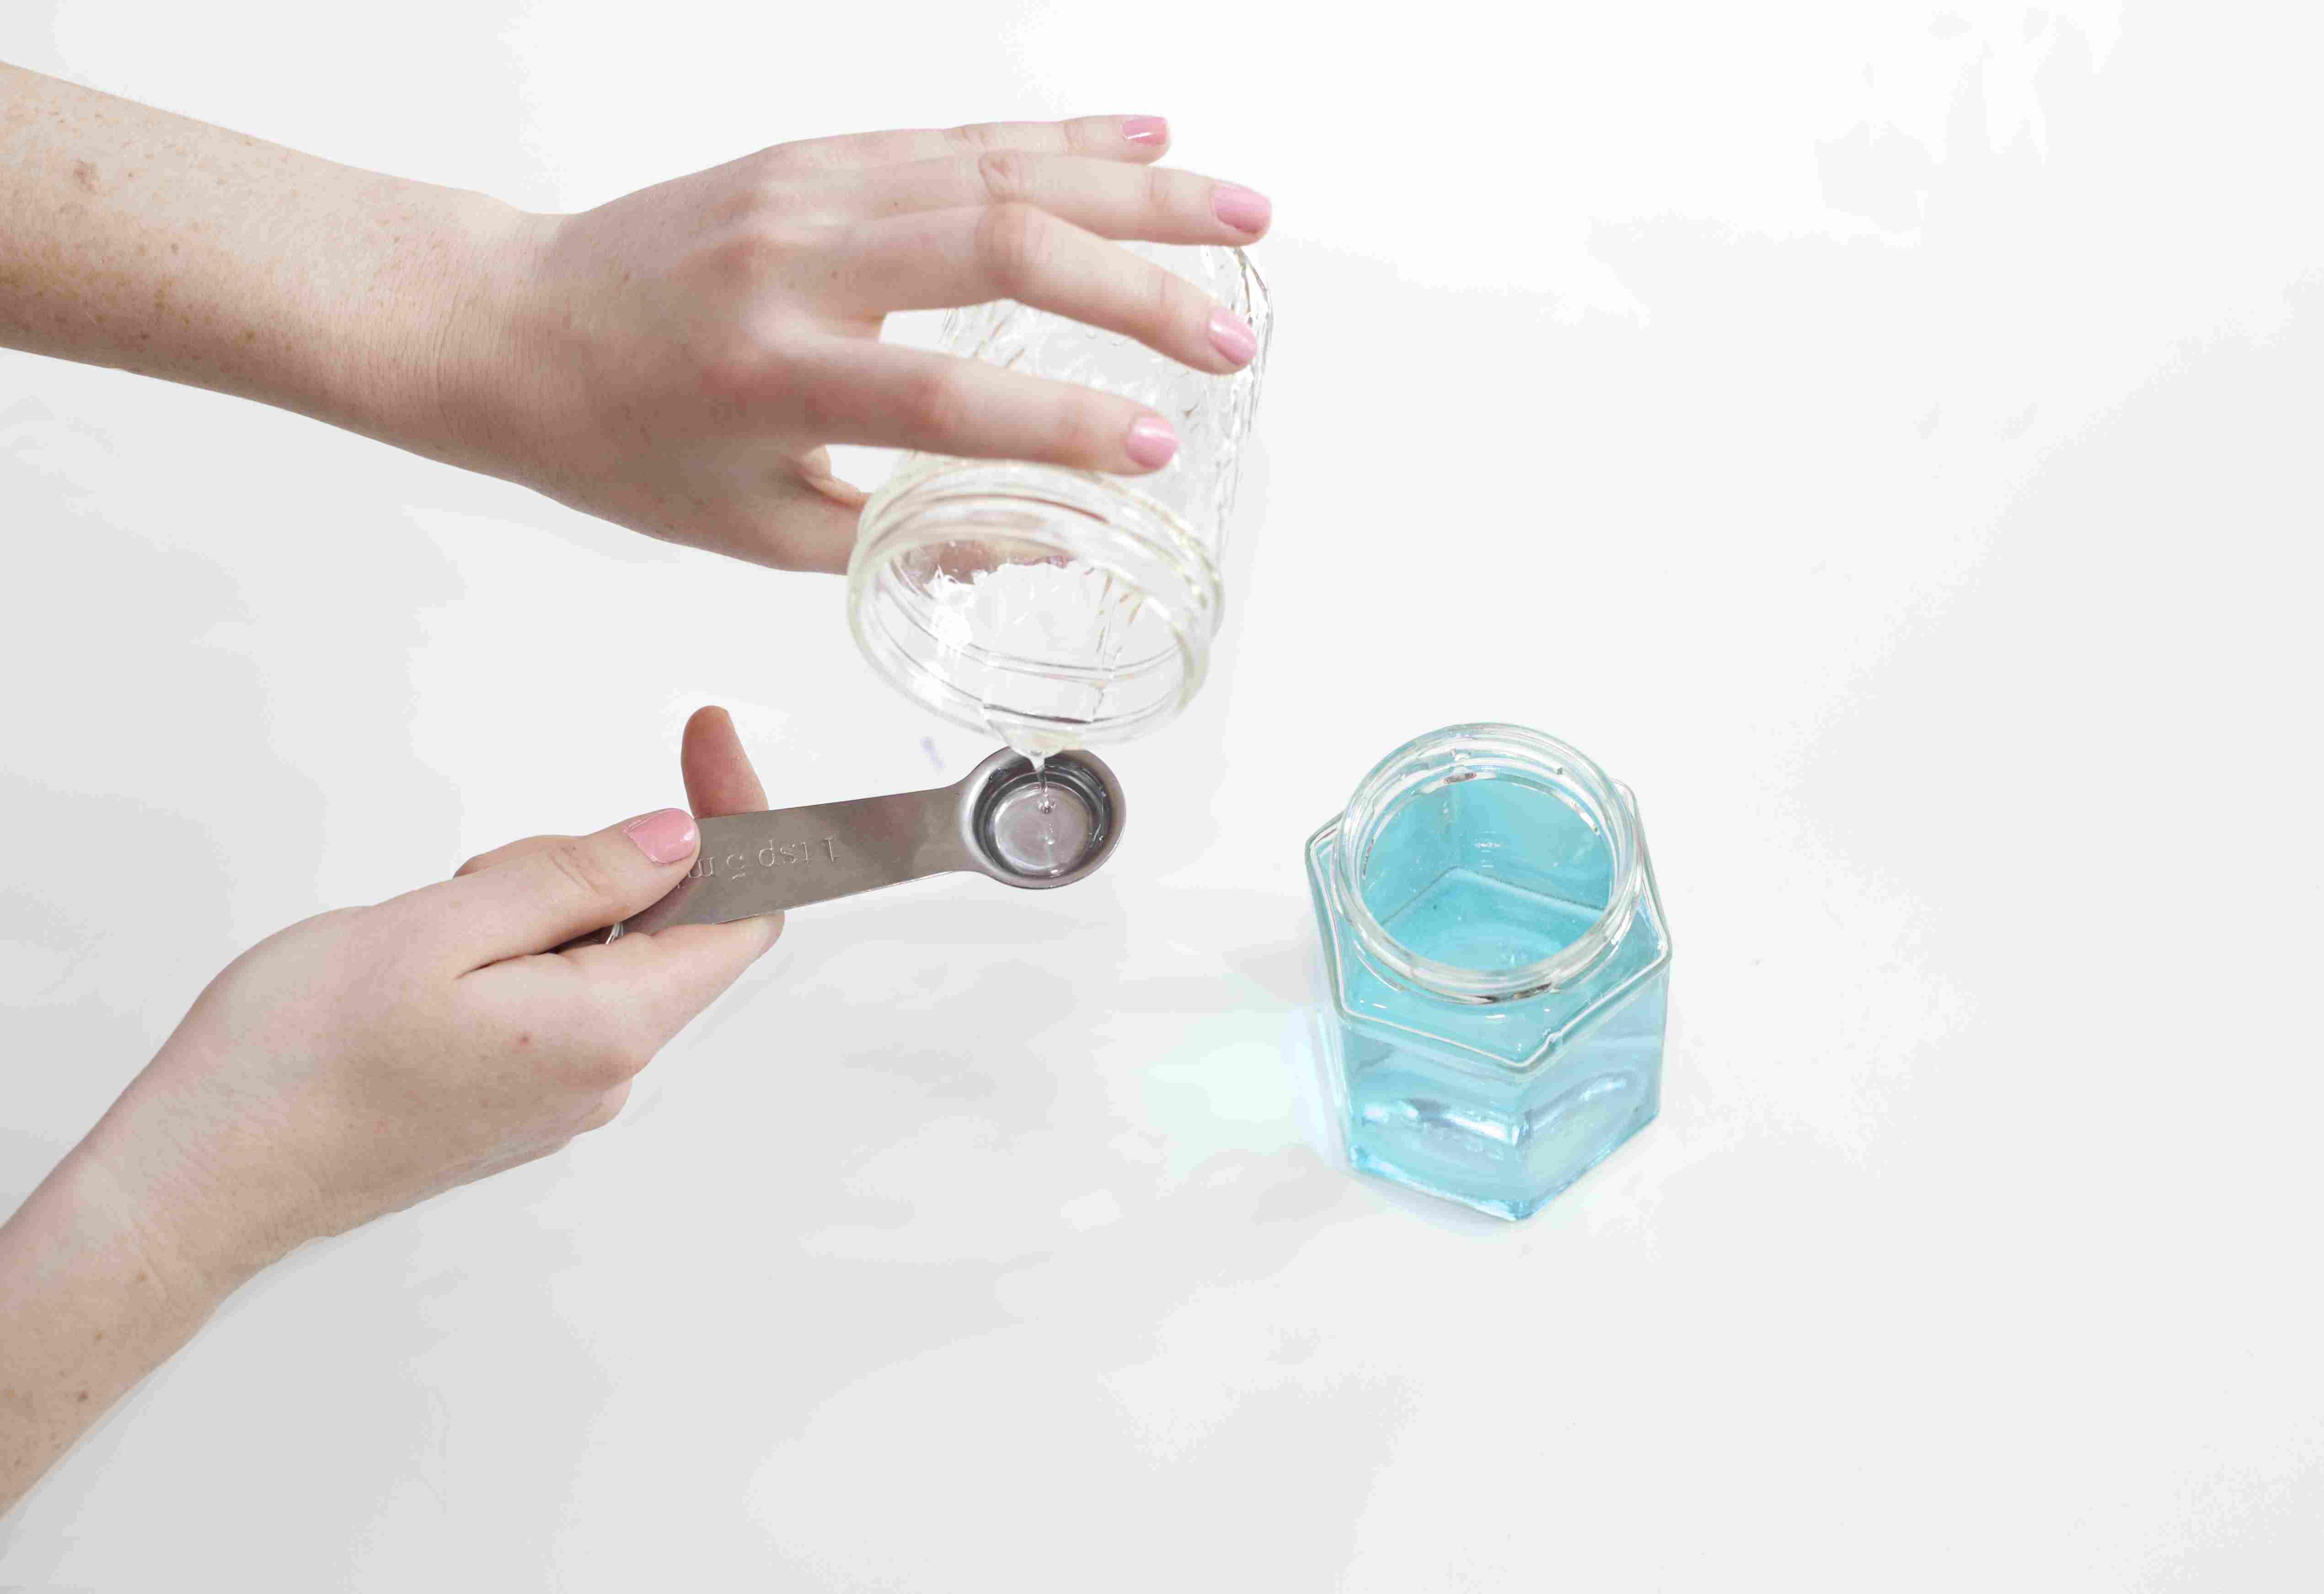 DIY bubble blowing mixture